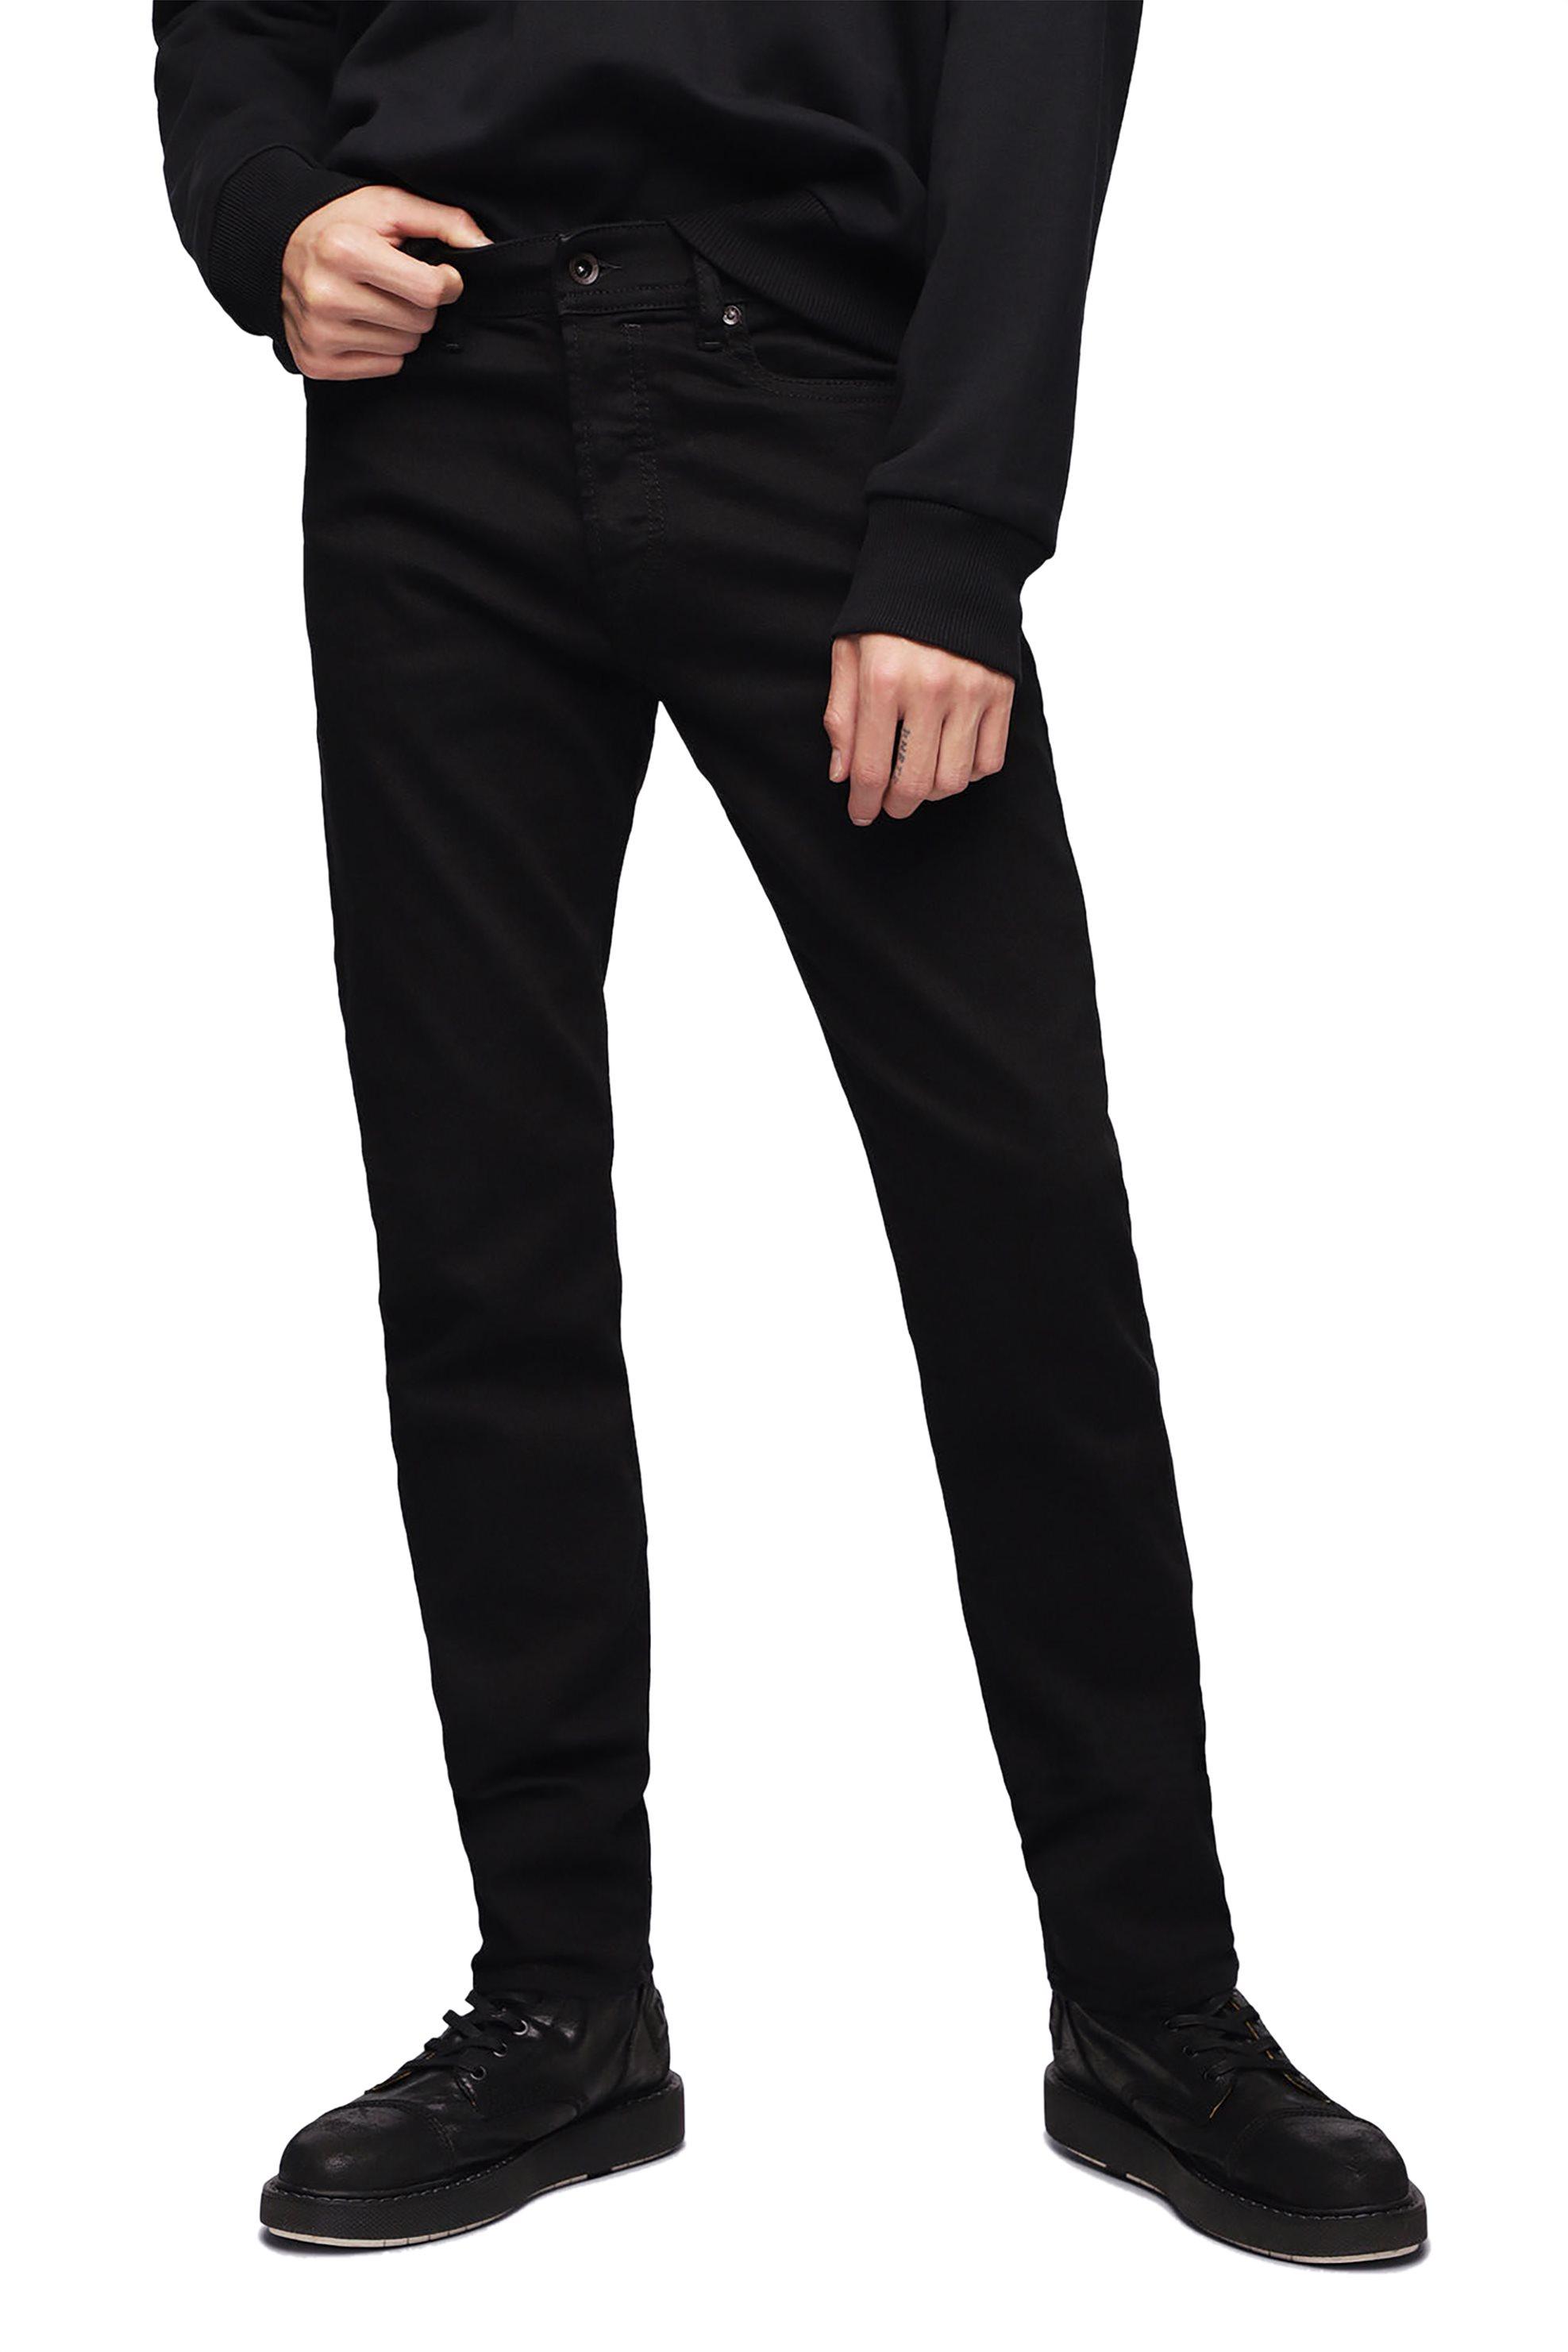 Diesel ανδρικό τζην παντελόνι Buster (32L) - 00SDHB 0886Z - Μαύρο ανδρασ   ρουχα   jeans   tapered